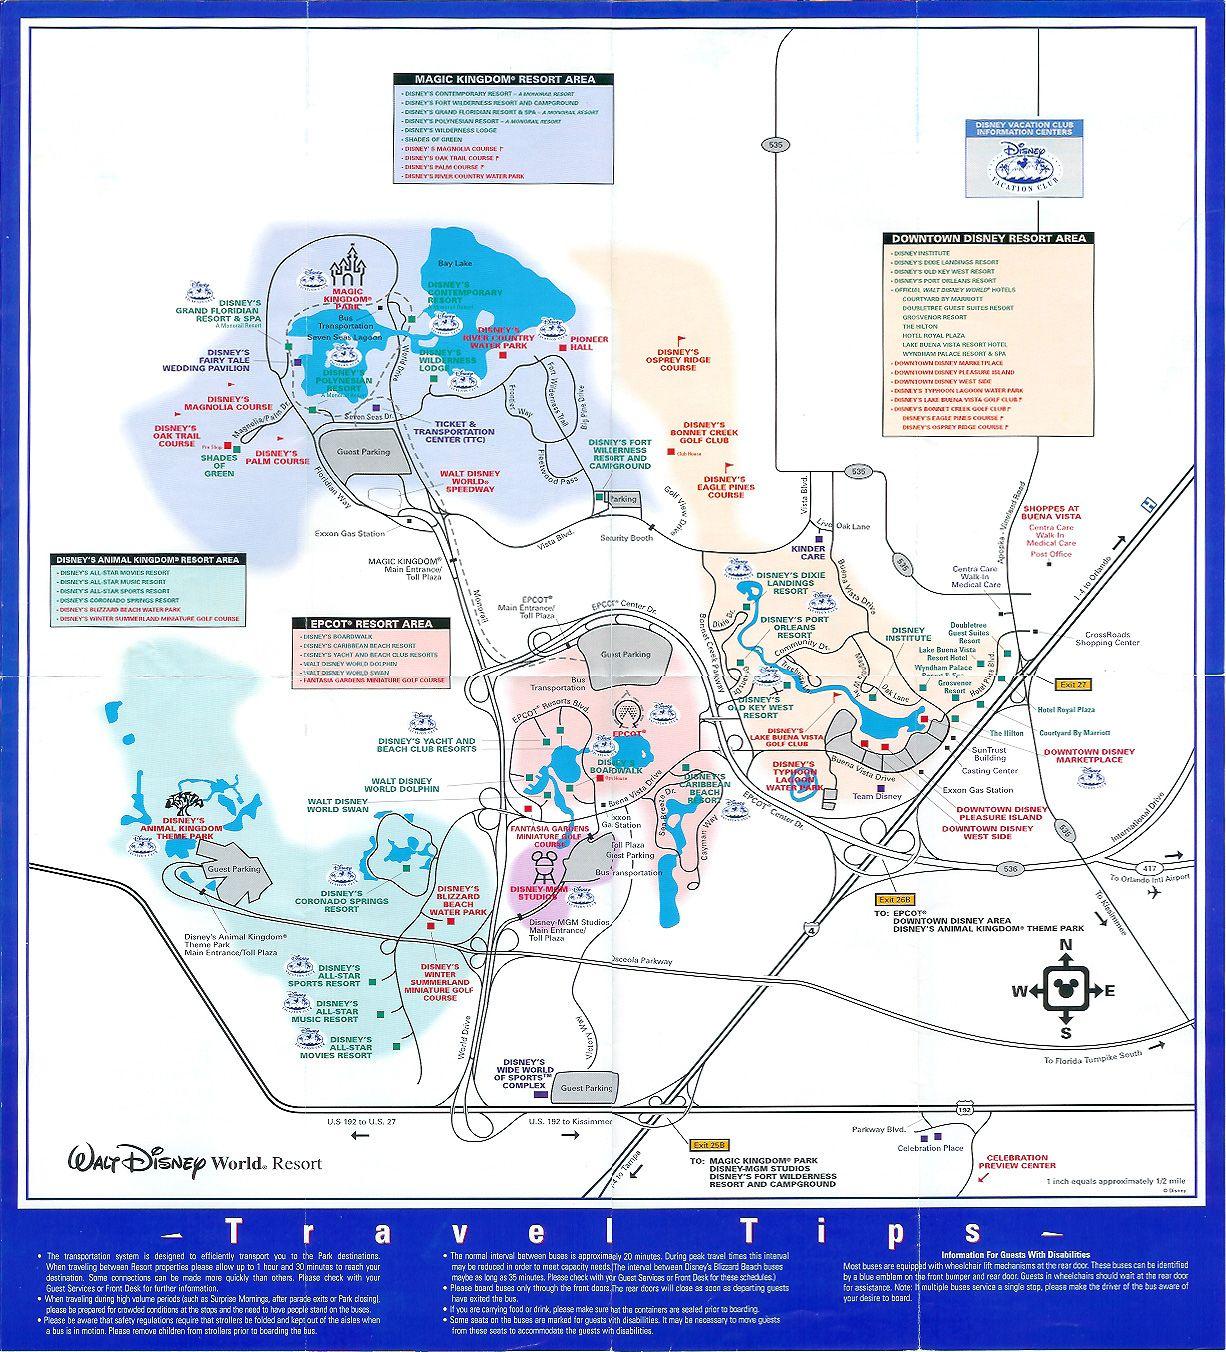 Walt disney world property 2003 theme park maps pinterest walt disney world property 2003 gumiabroncs Images